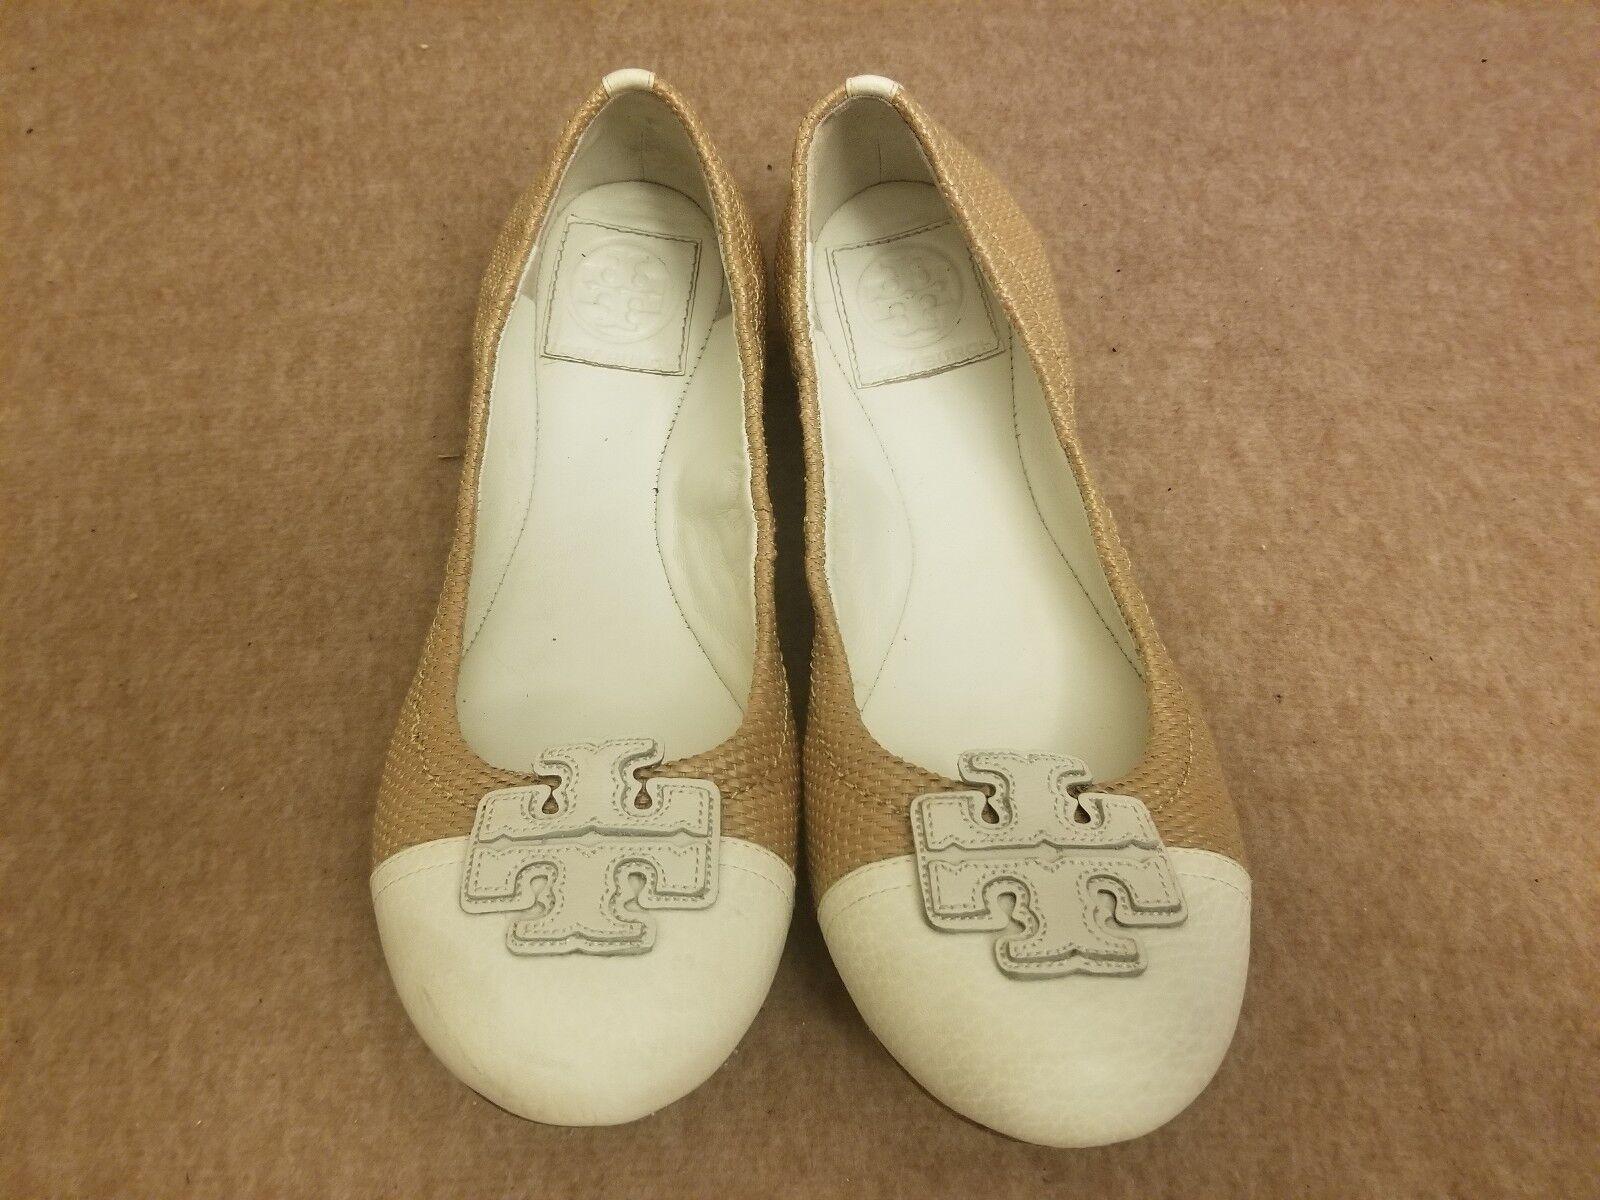 Tory Burch Women Tan Leather Straw Woven Big Logo Ballet Flats shoes Size 7 M